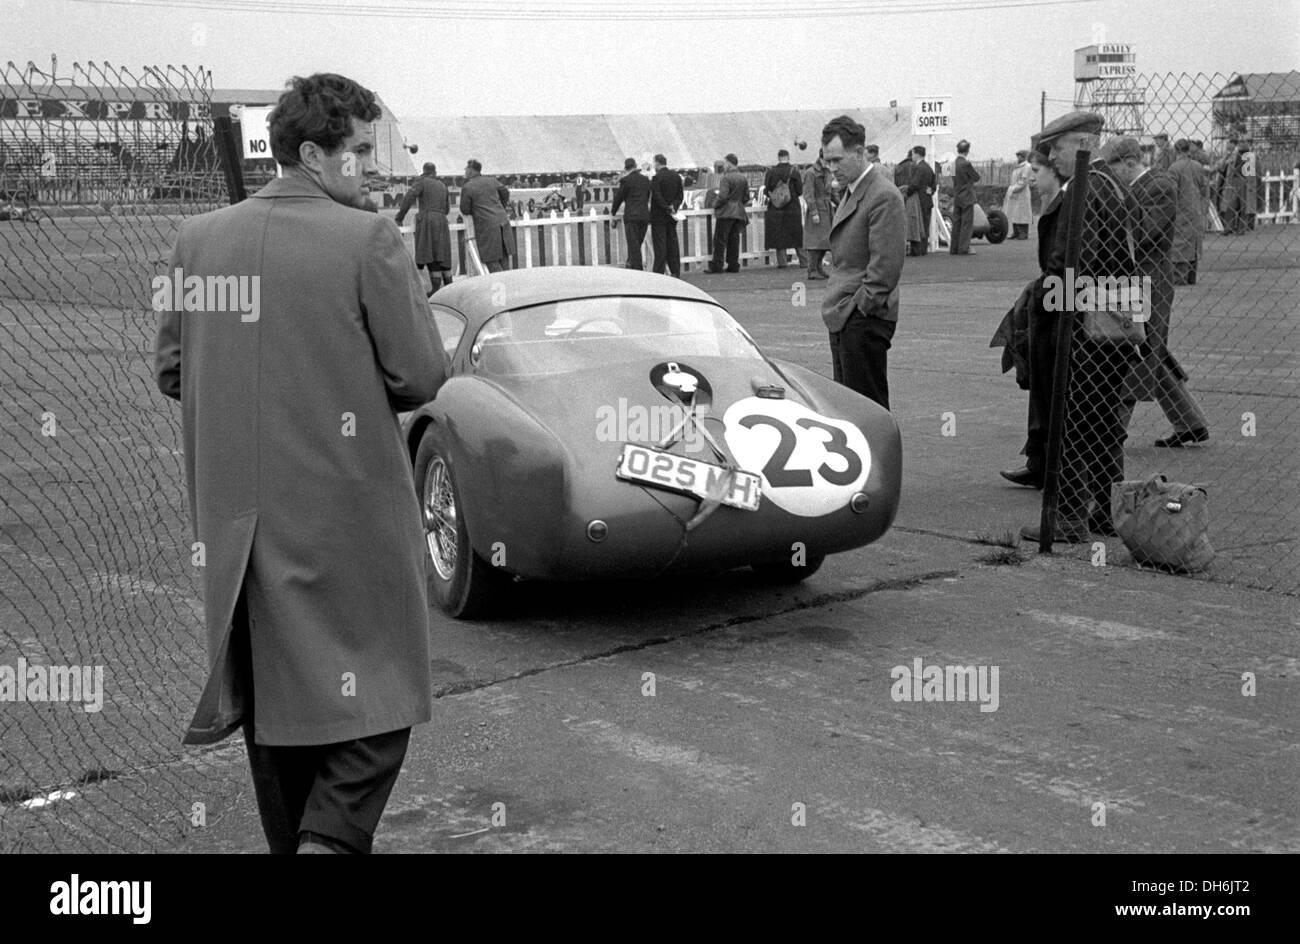 Roy Salvadori in seinem Aston Martin DB3S Coupe beendet 7. in Silverstone International Race, England 15. Mai 1954. Stockbild